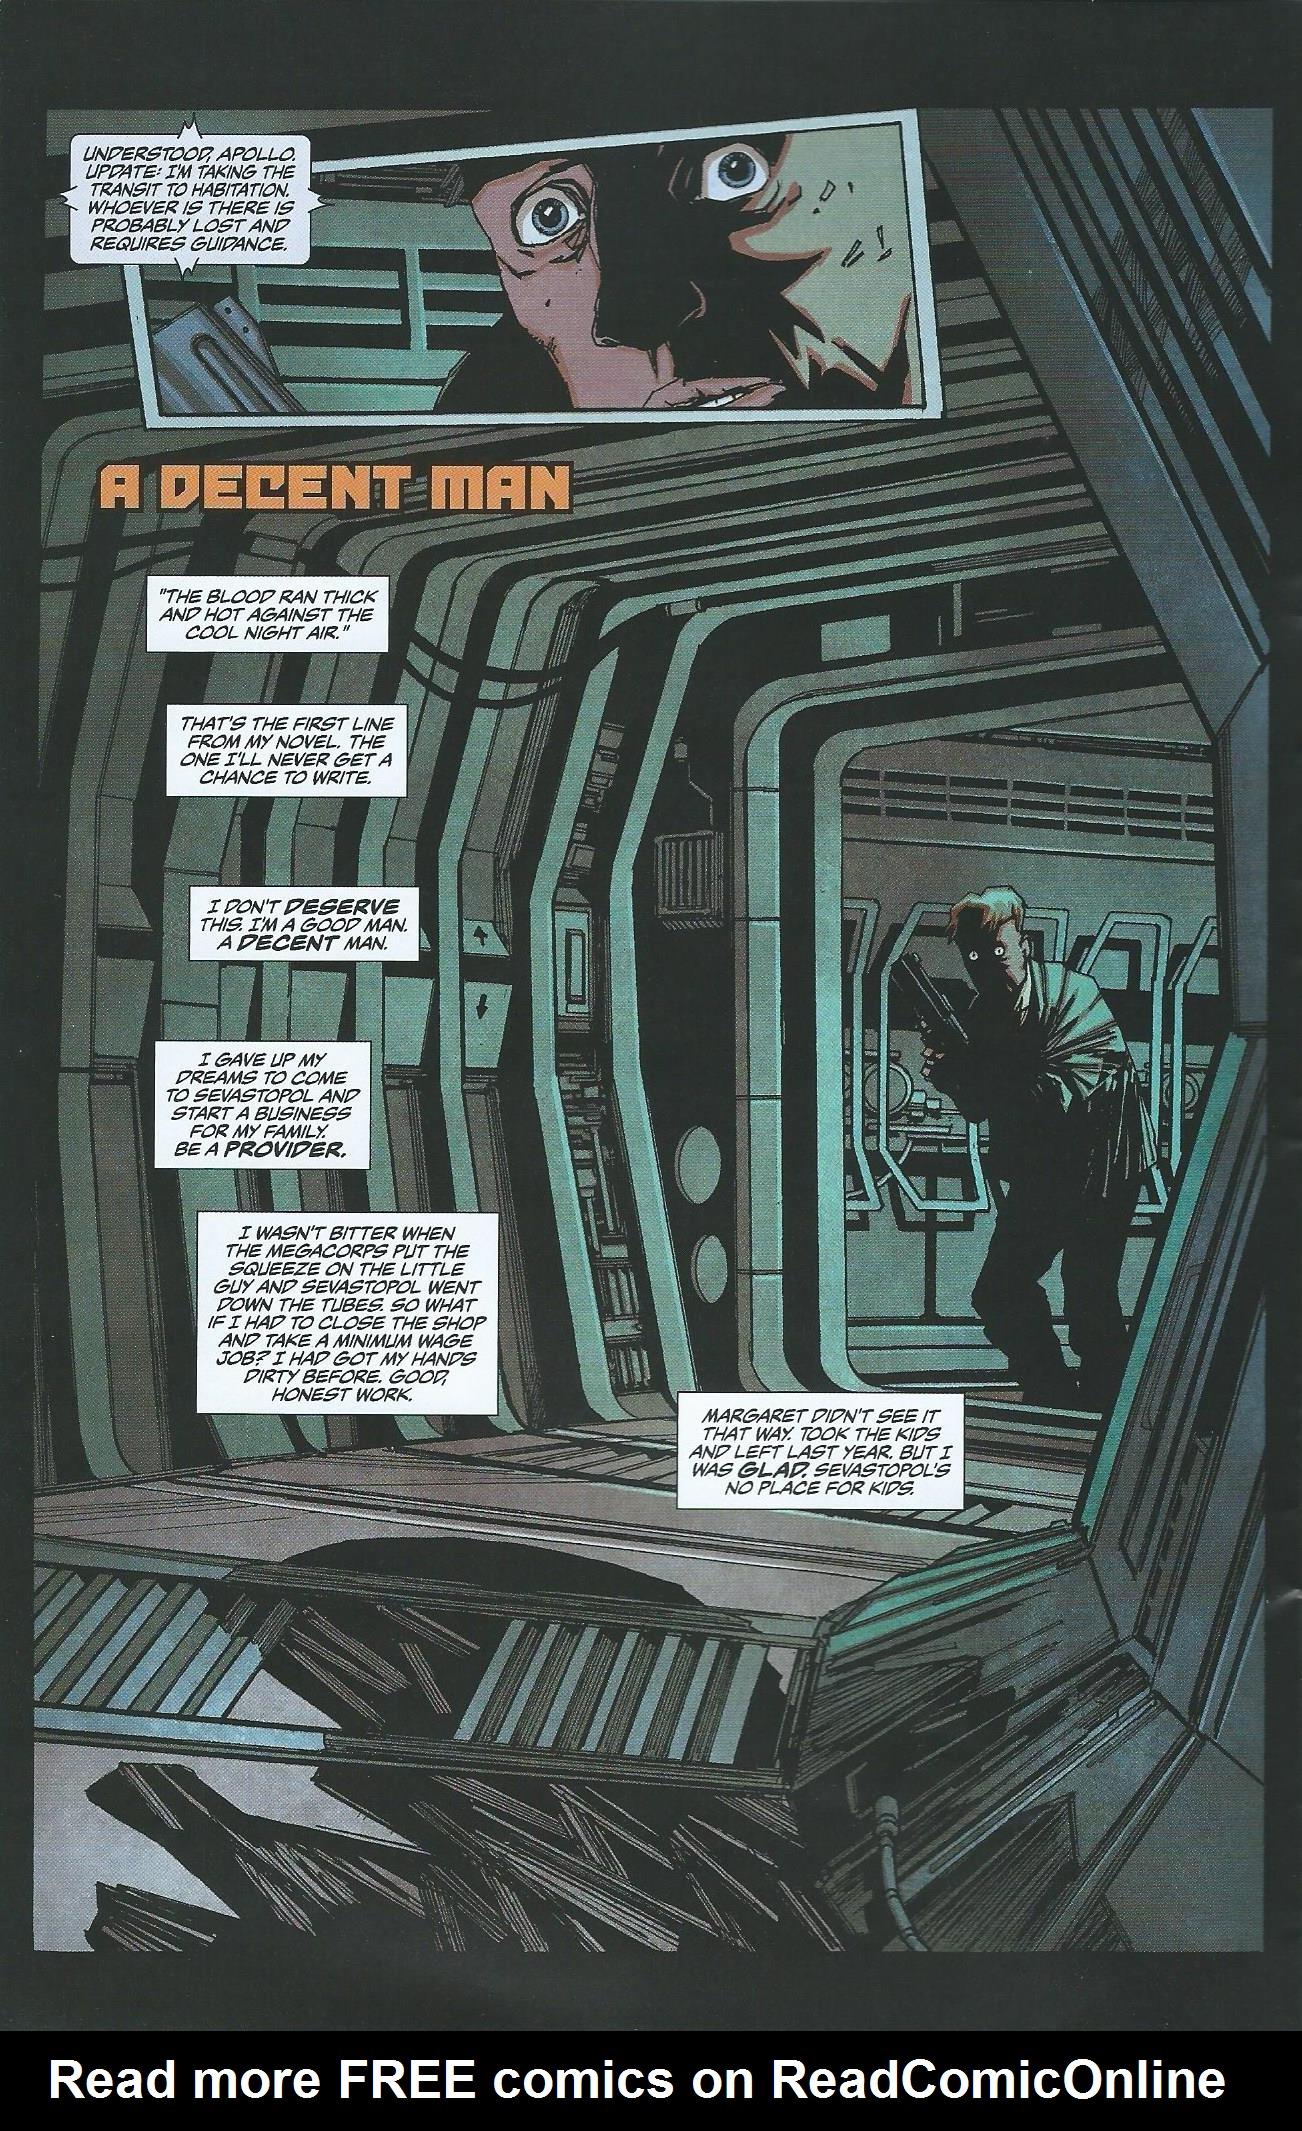 Read online Alien: Isolation comic -  Issue # Full - 9